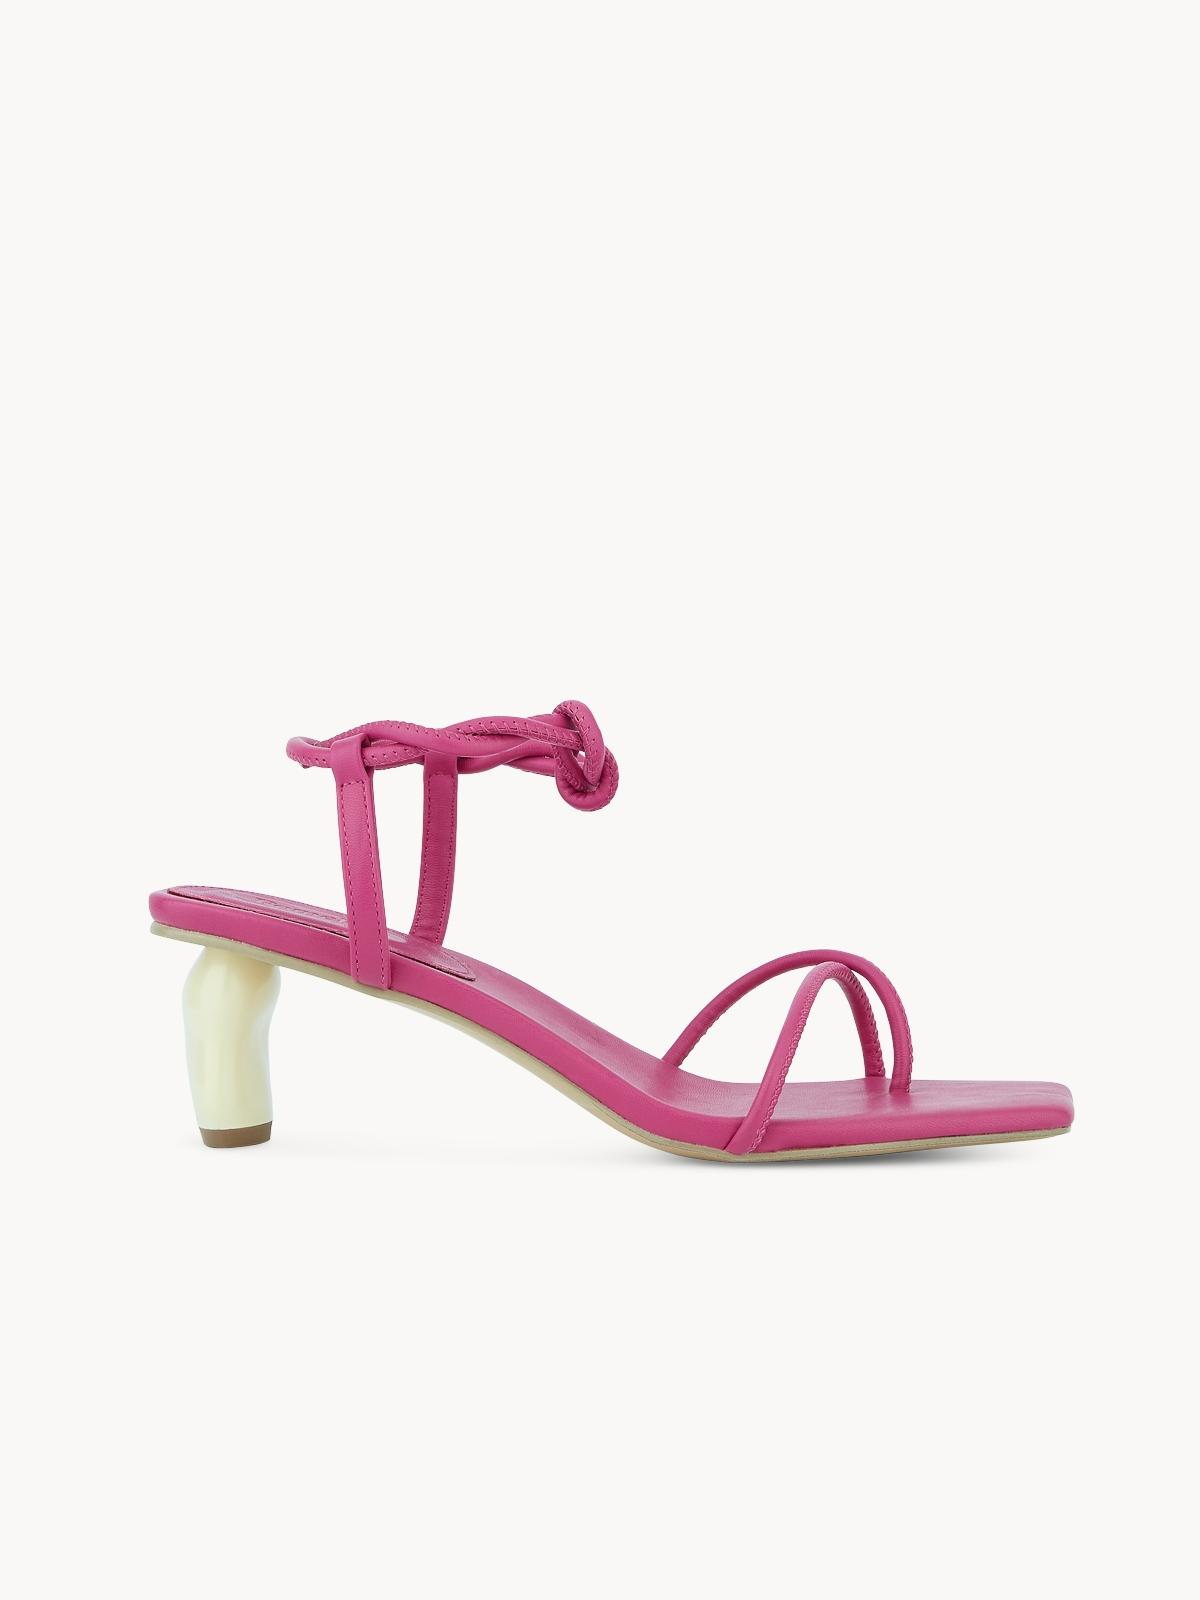 Starkela Ankle Strap Heels Pink